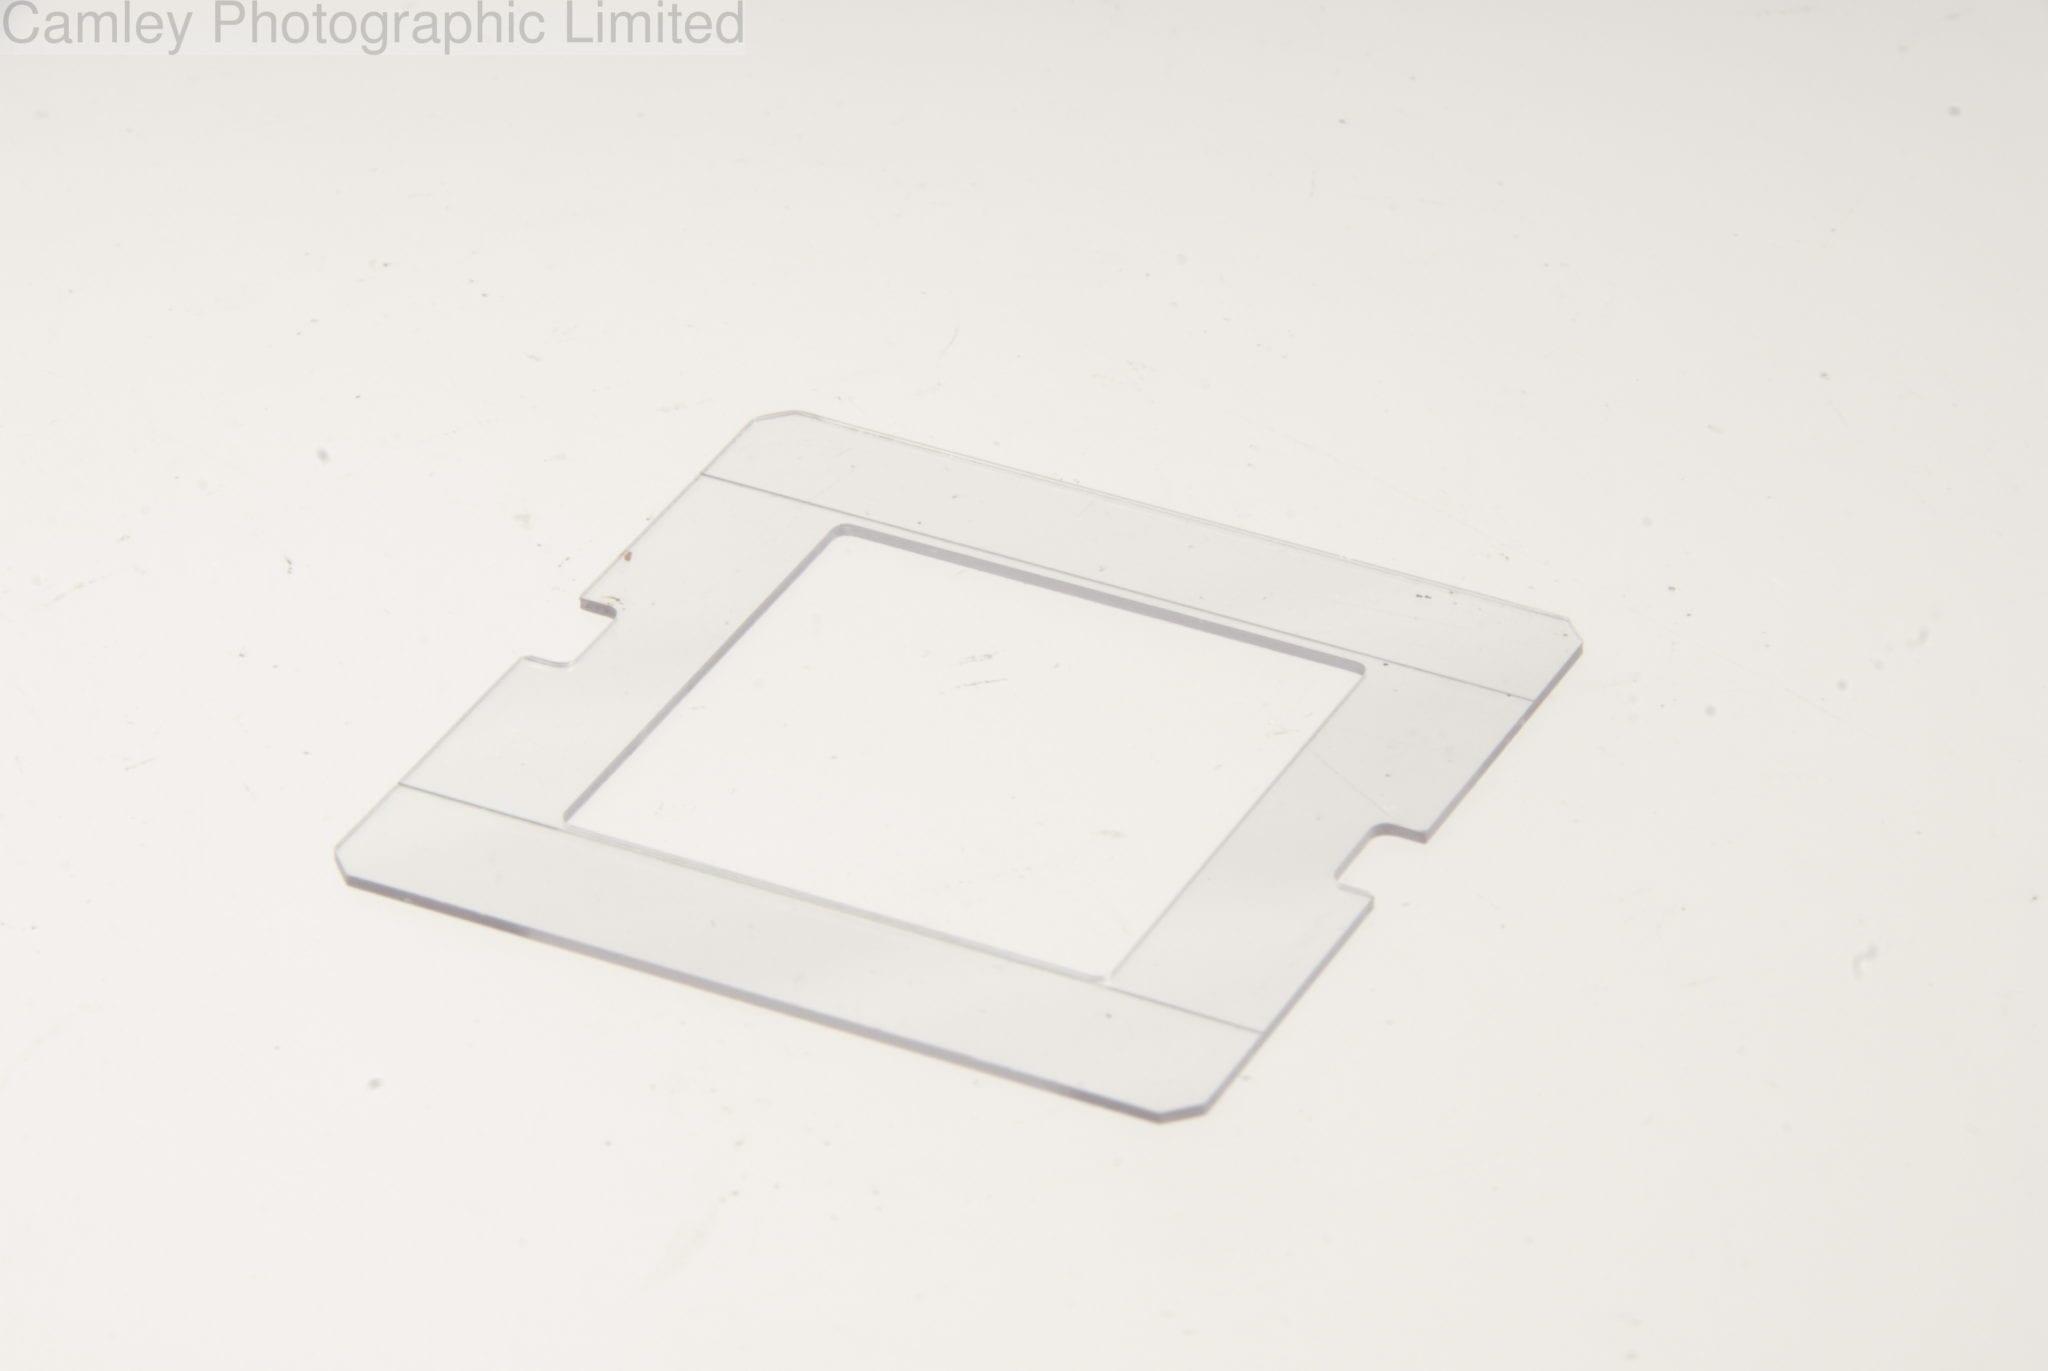 Hasselblad Transparent Focusing Screen Mask 645 (42145